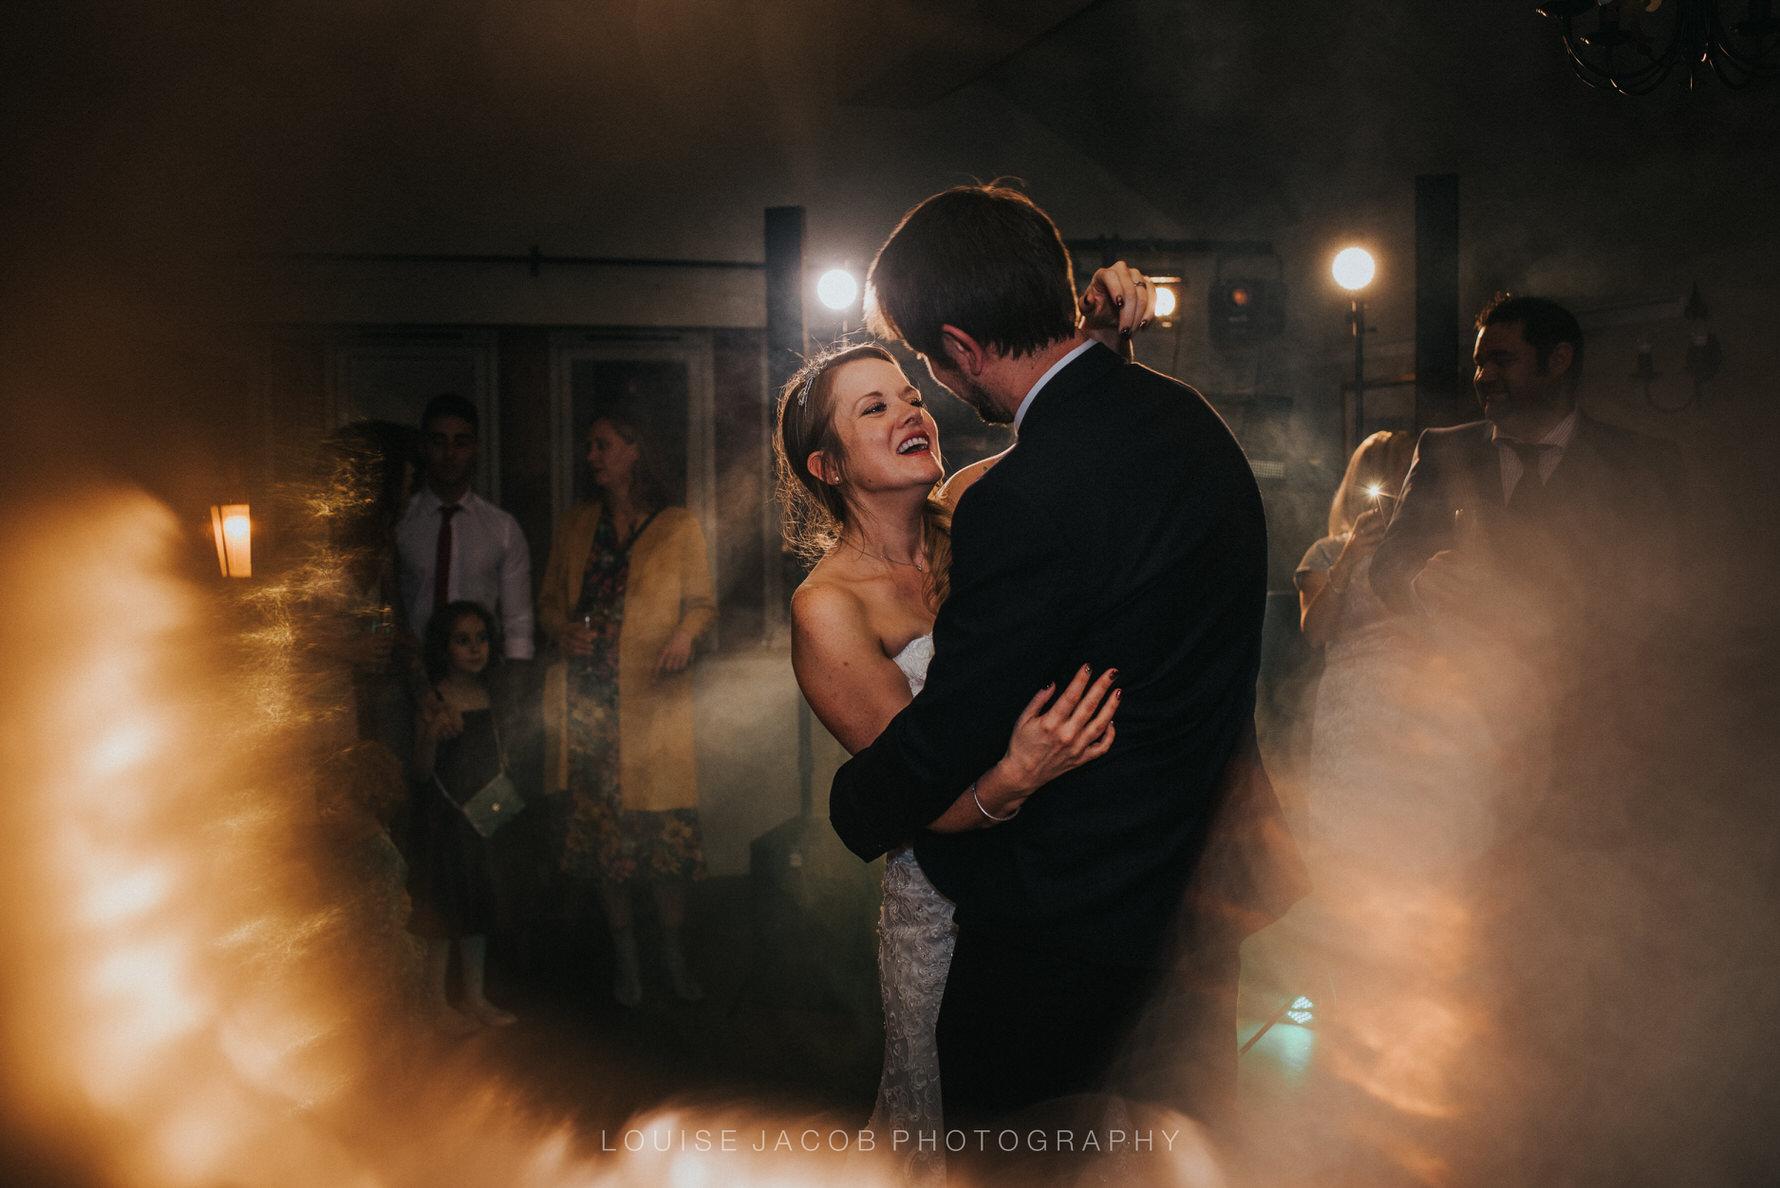 Candid Unposed Cheshire Documentary Wedding Photography